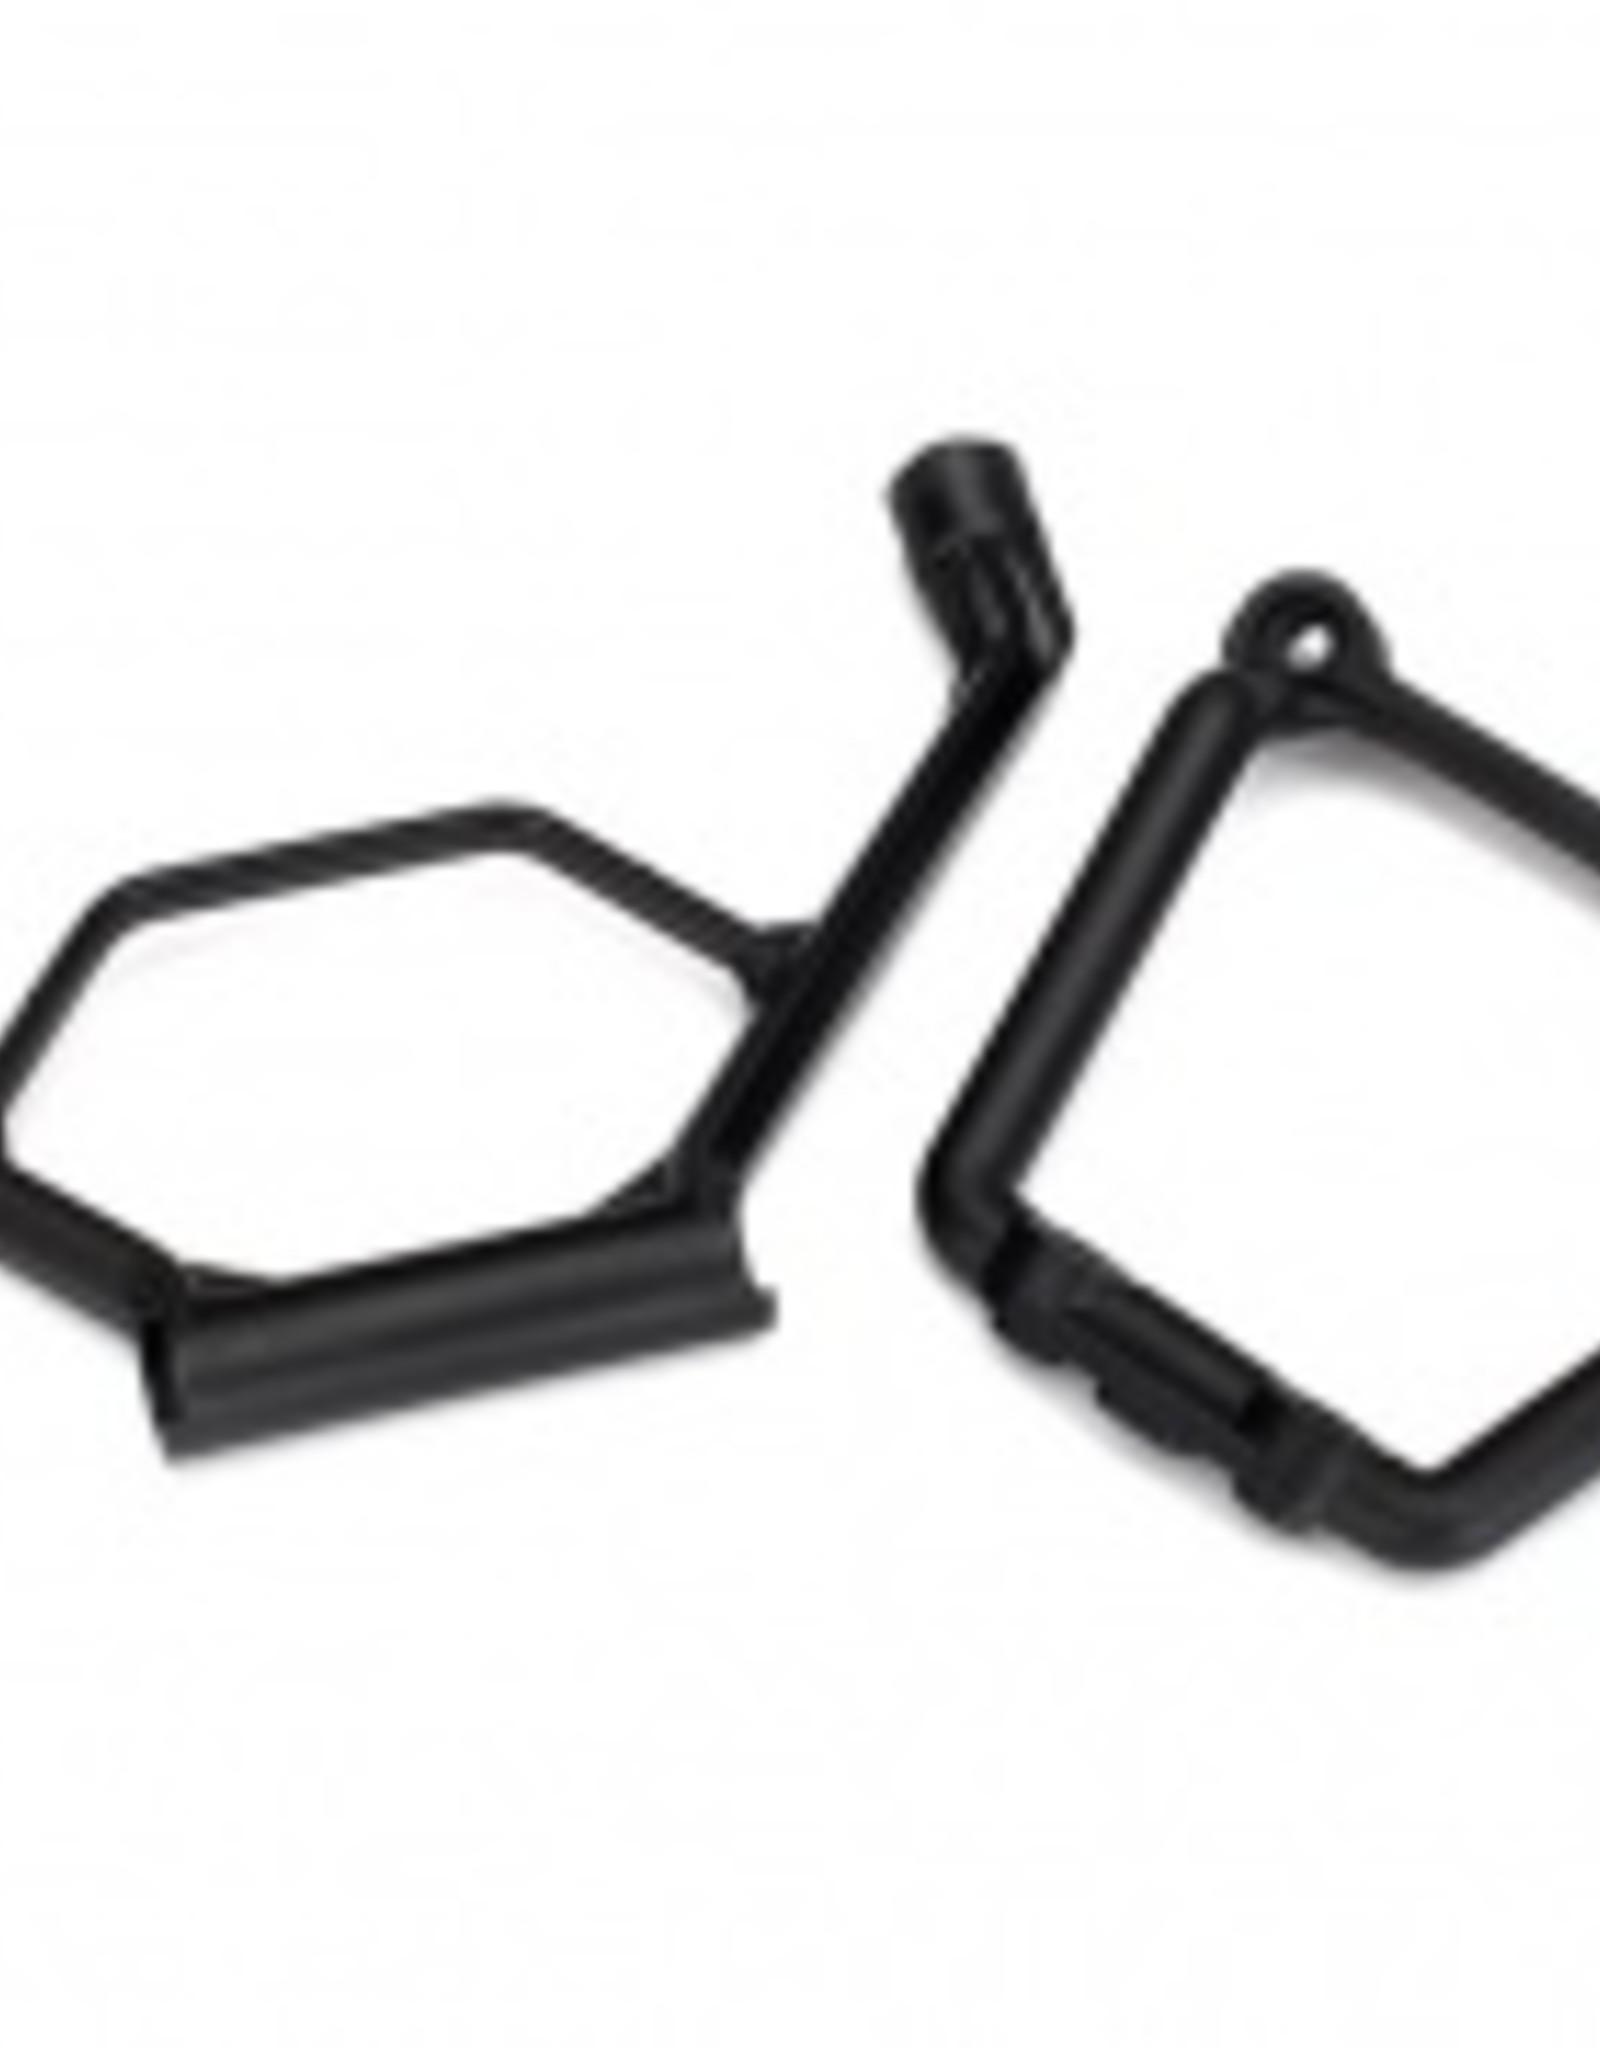 Traxxas Traxxas X-Maxx Bumper mount, front/ bumper support